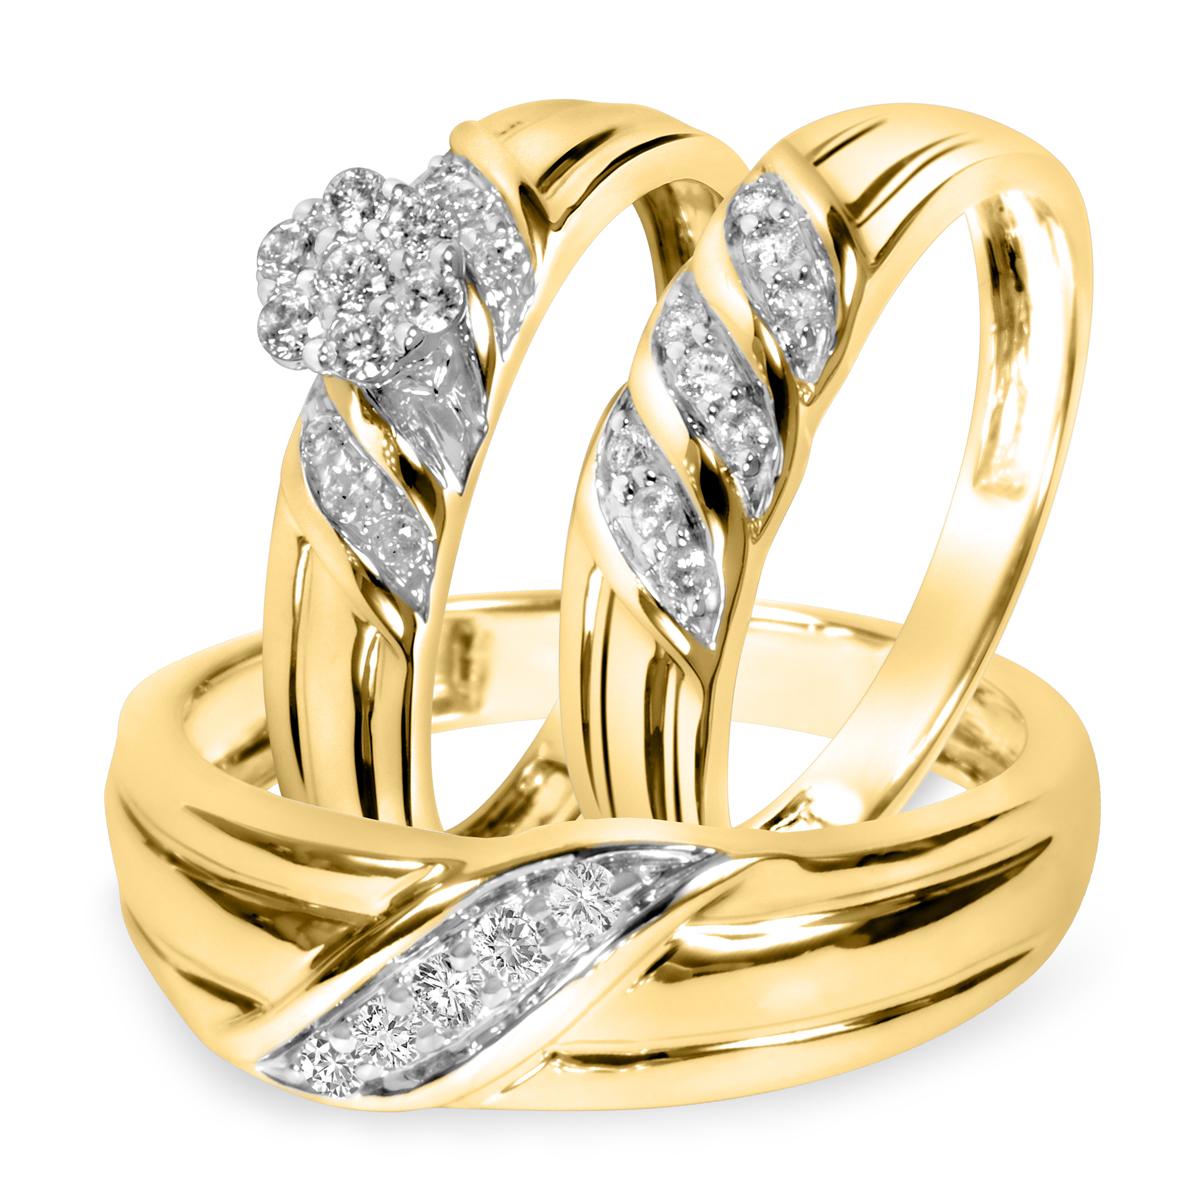 3/8 Carat T.W. Round Cut Diamond Women's Engagement Ring, Ladies Wedding Band,